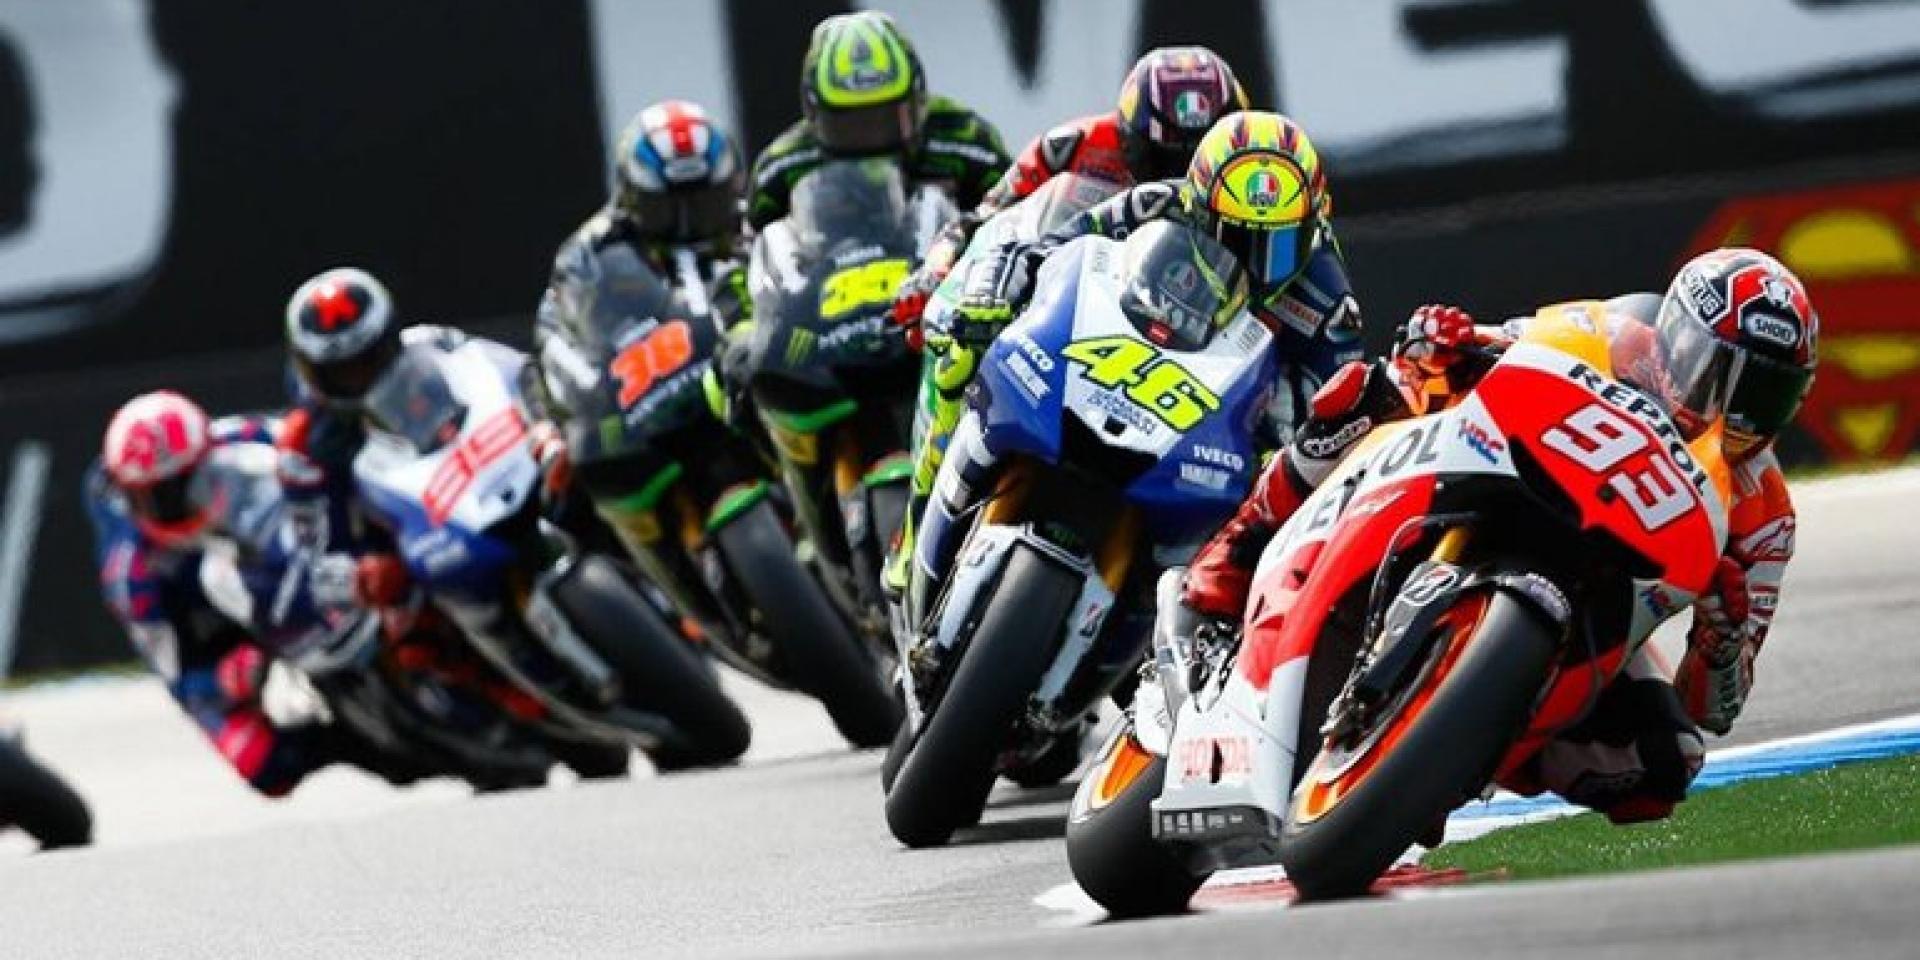 MotoGP迫使Formula 1離開馬來西亞,費用太貴又賺不到錢才是主因